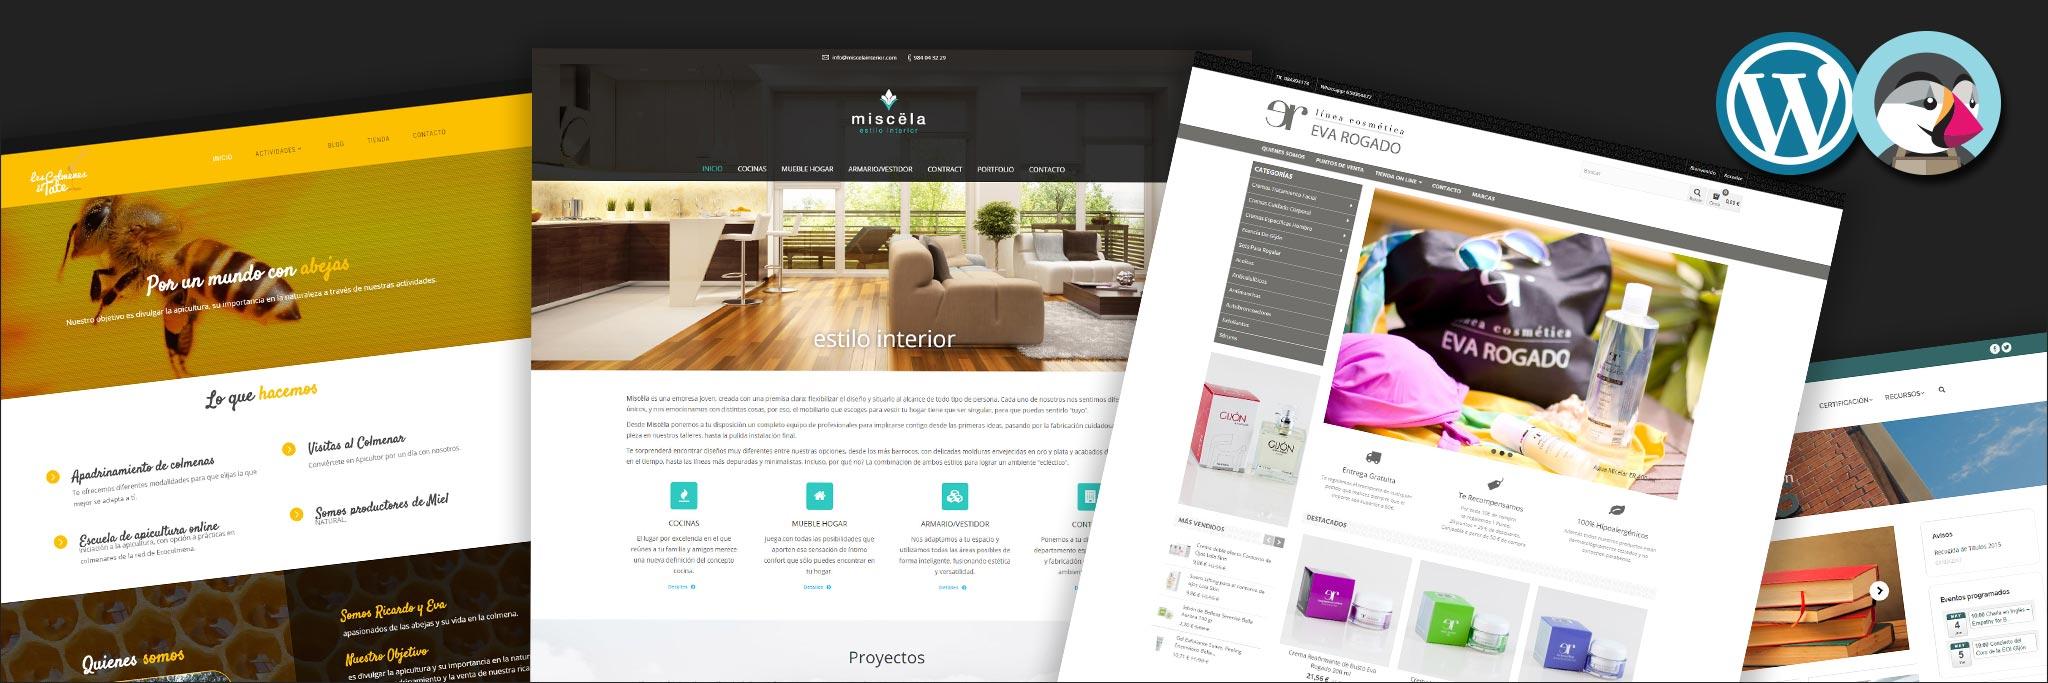 Web y E-Commerce